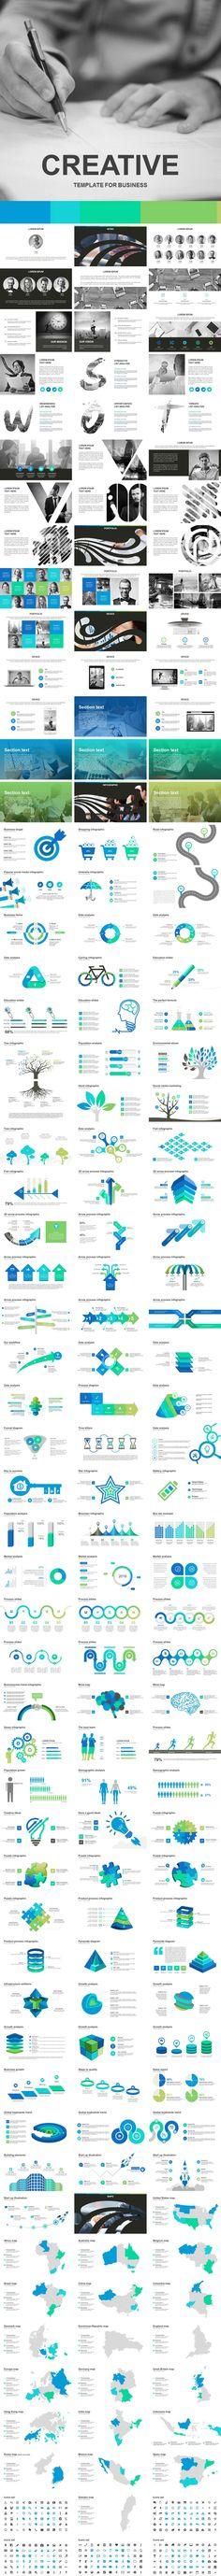 Creative GoogleSlides Template — Google Slides PPTX #value proposition #deluxe • Download ➝ https://graphicriver.net/item/creative-googleslides-template/18922564?ref=pxcr